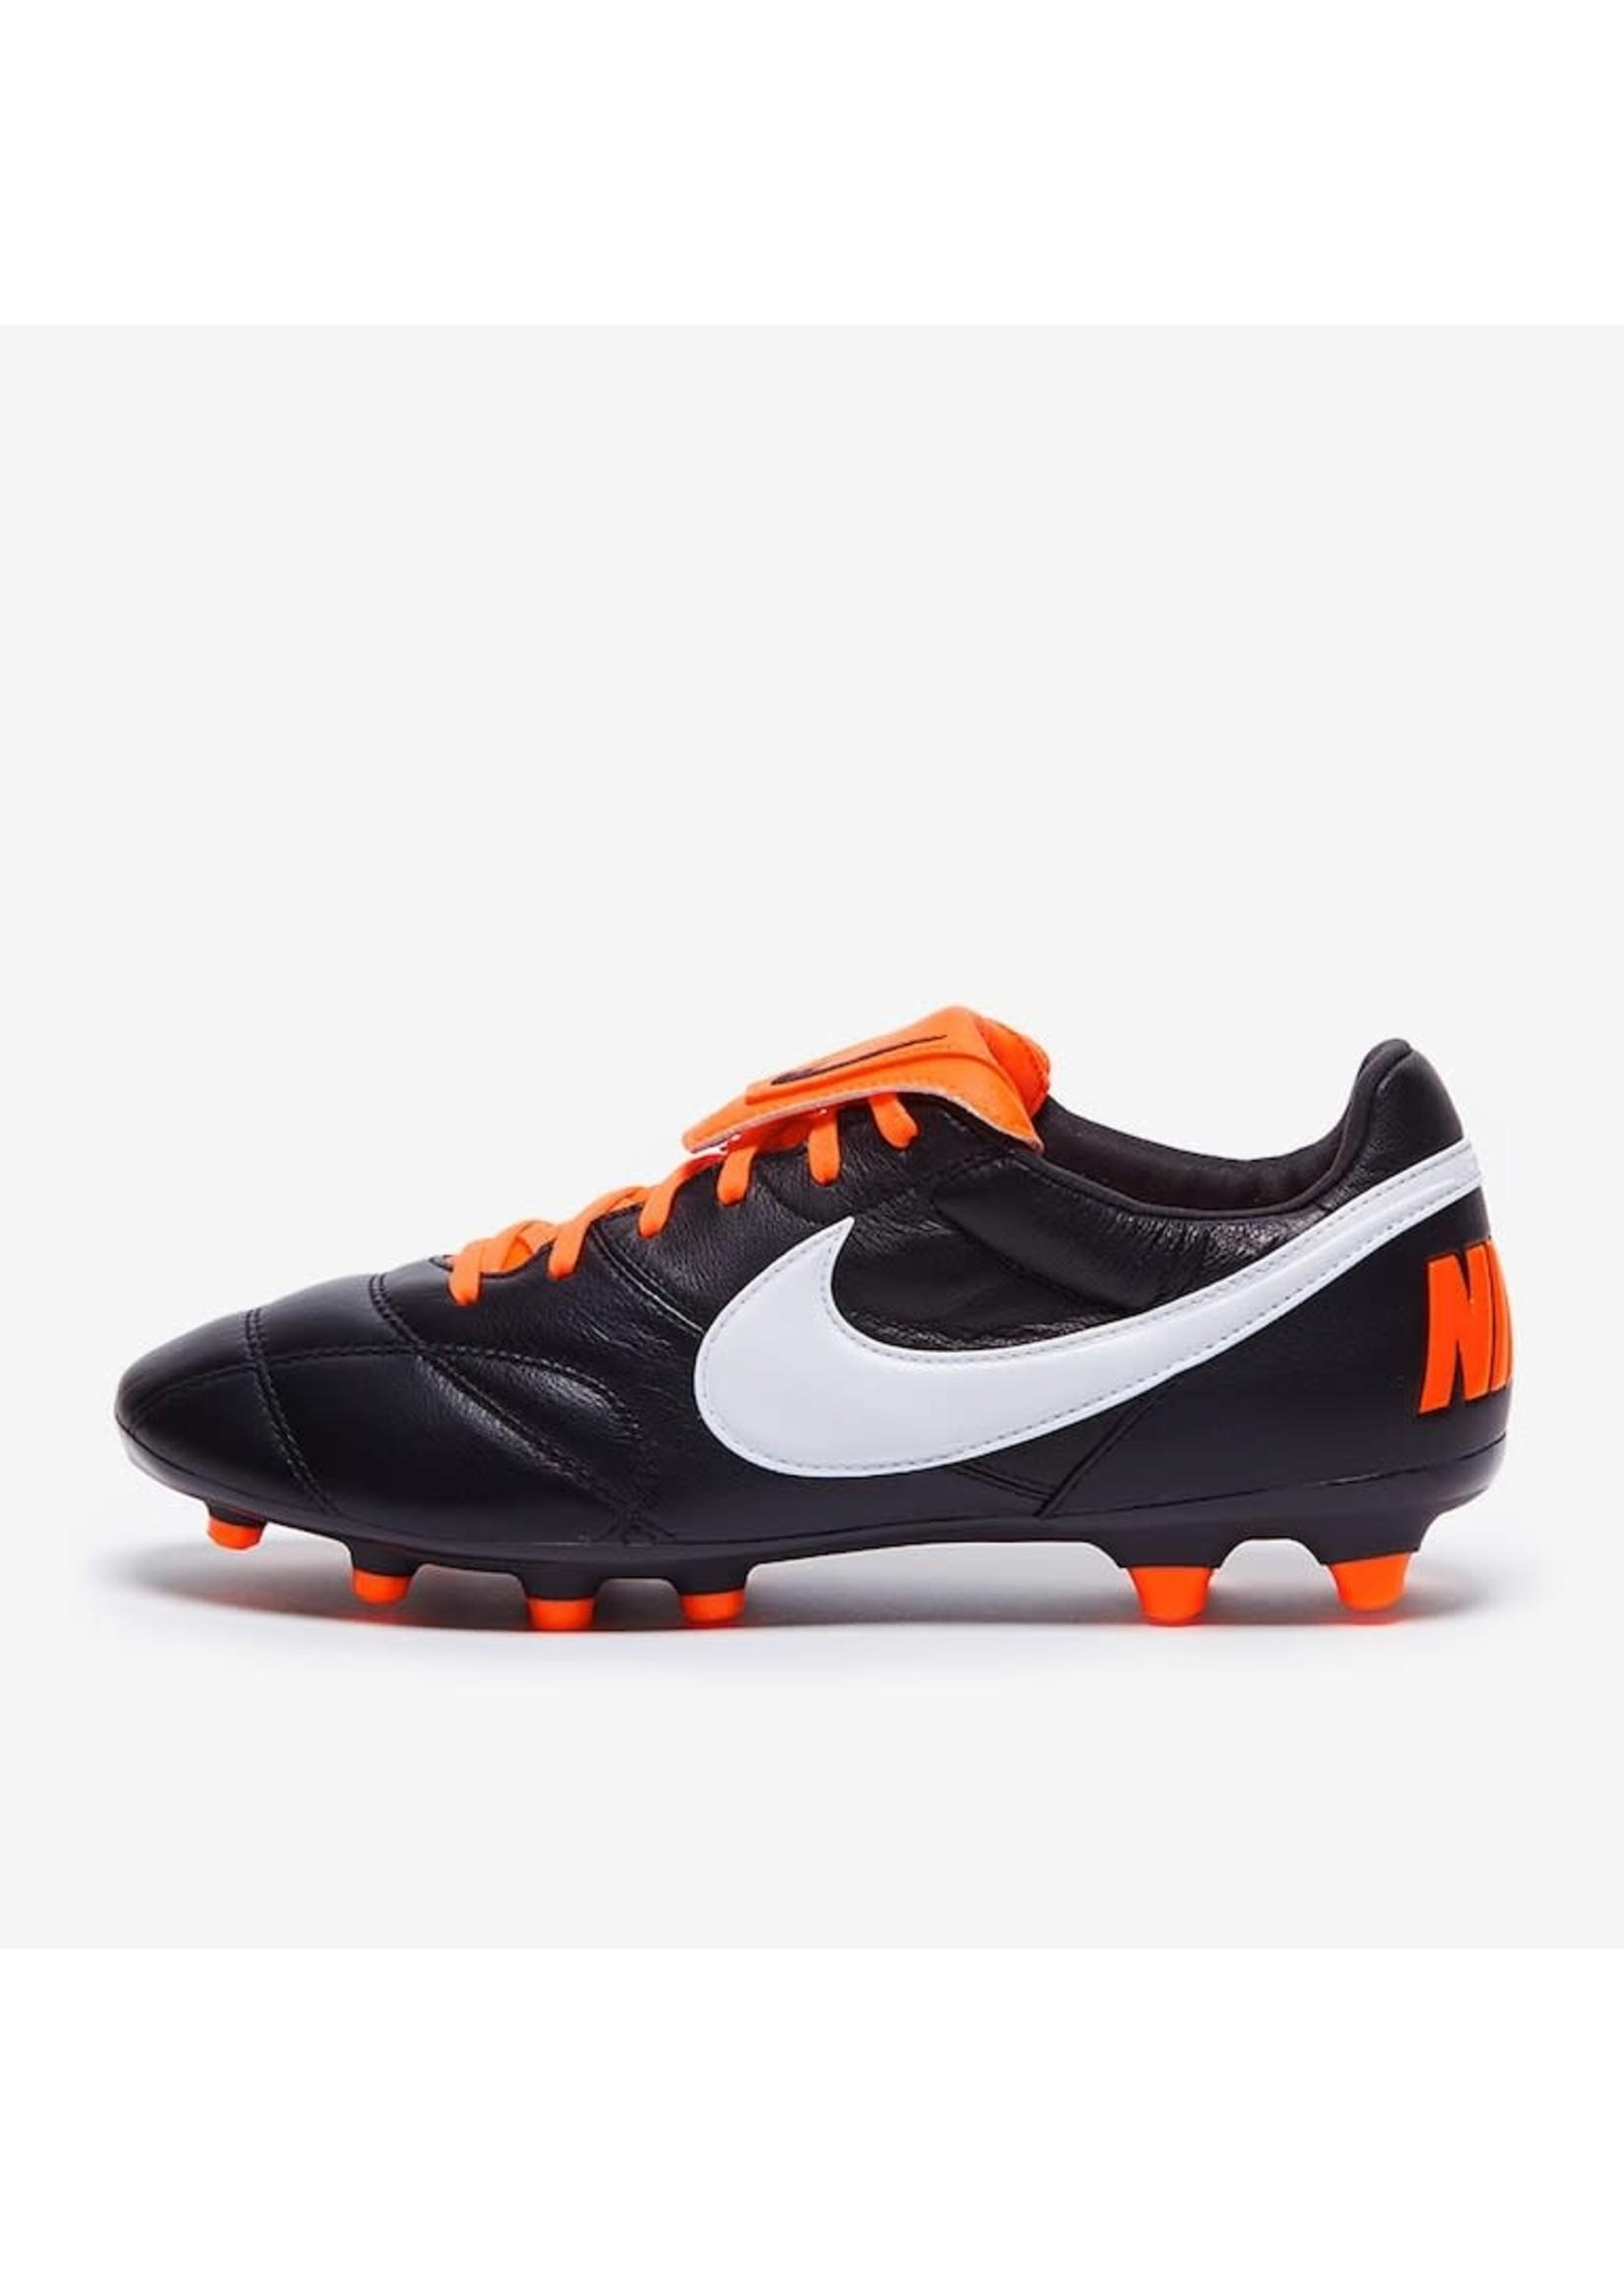 Nike Premier II FG - Black/Orange